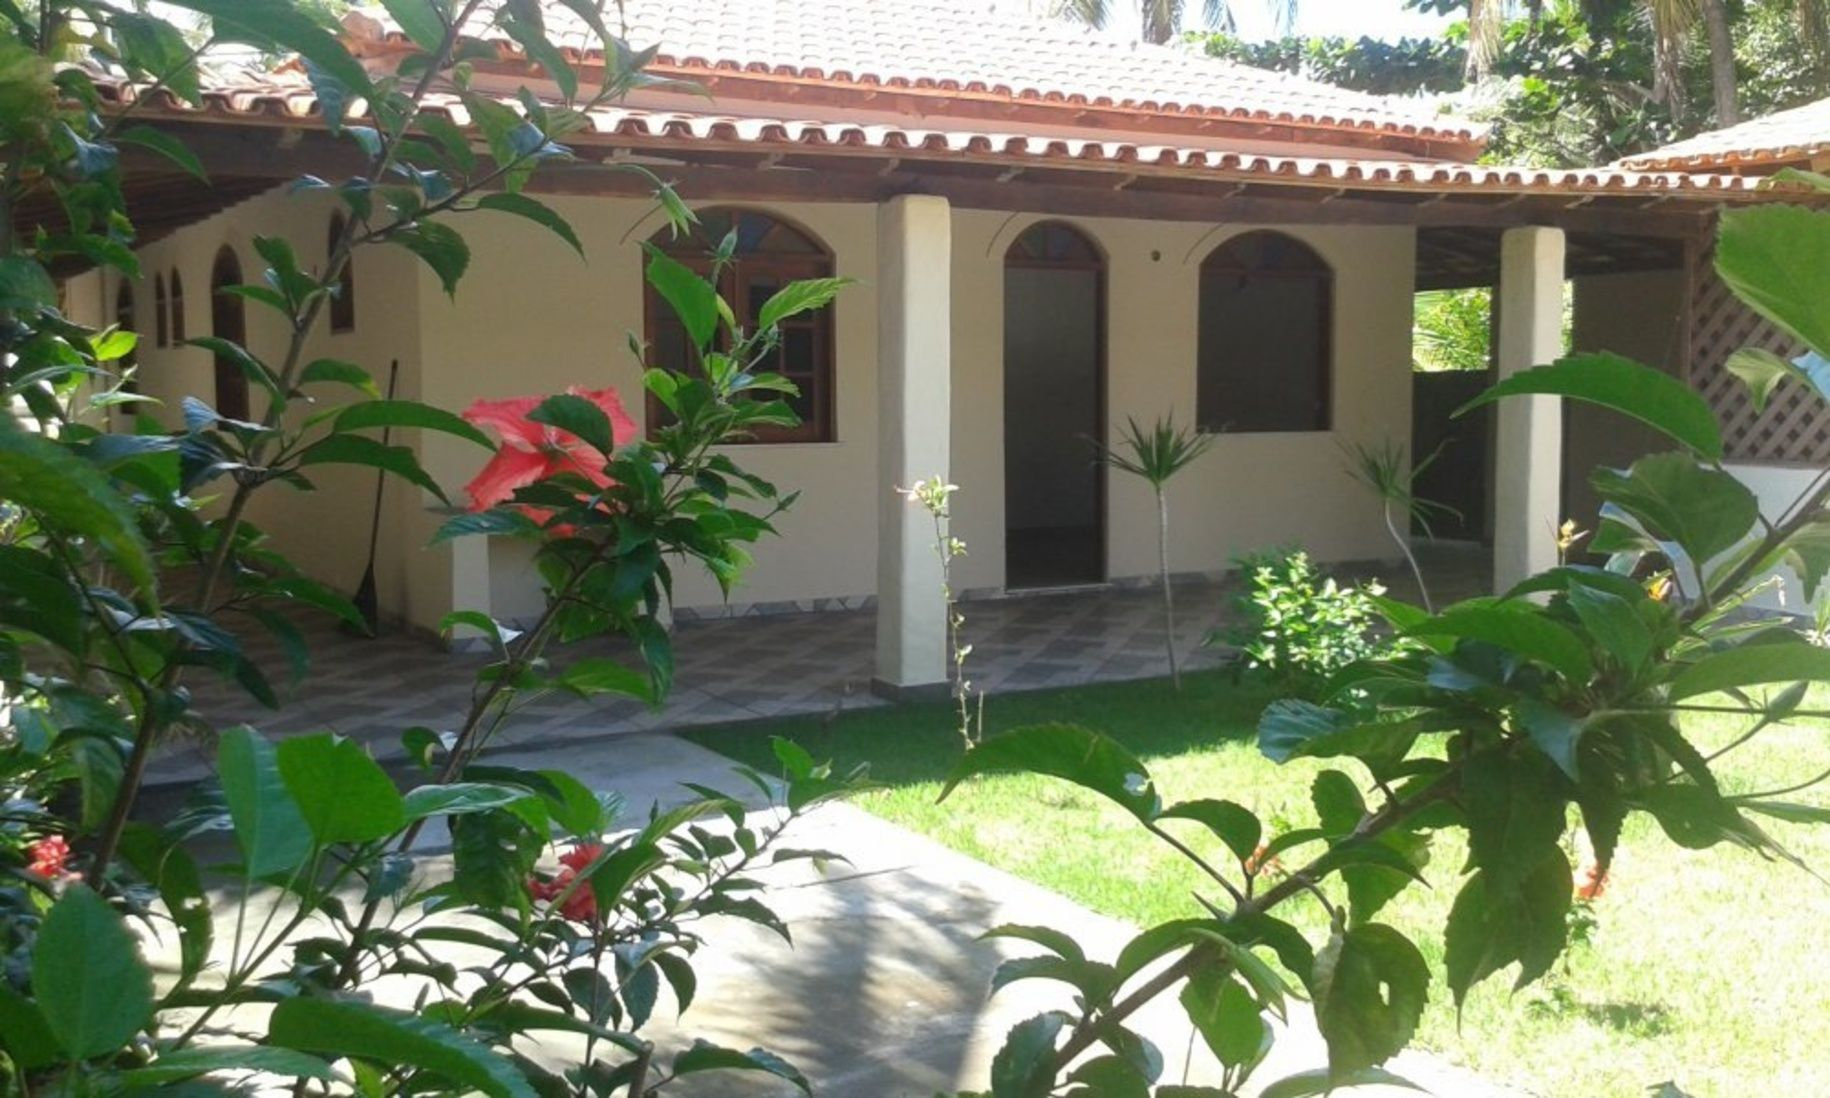 Brasilien Bahia Immobilie In Canavieiras Haus Am Meer Zu Verkaufen Kaufpreis 15 Reduziert Auf 89 000 Euro Brasilien B Outdoor Structures Outdoor Pergola